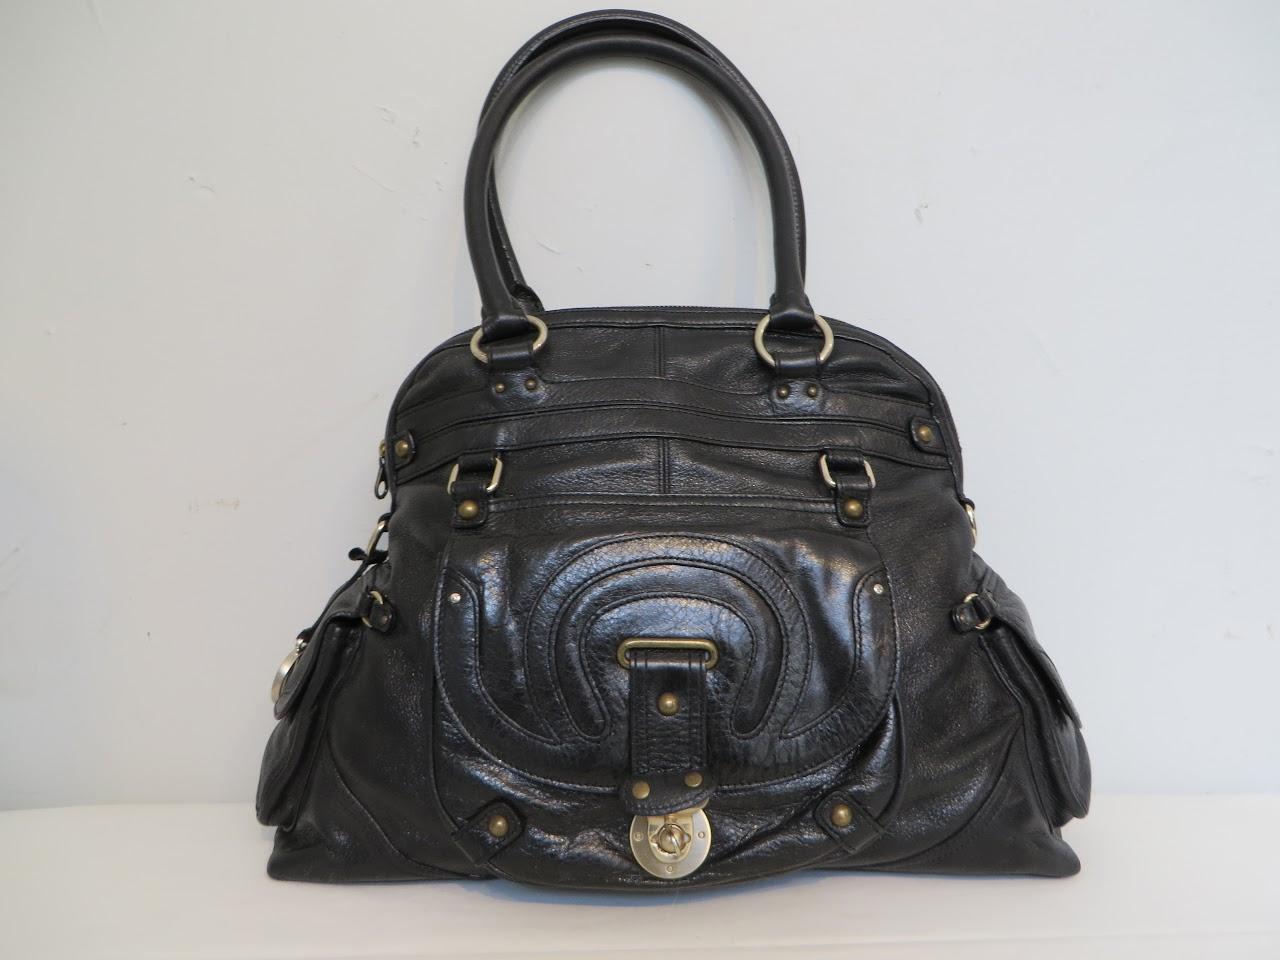 Hayden-Harnett Shoulder Bag